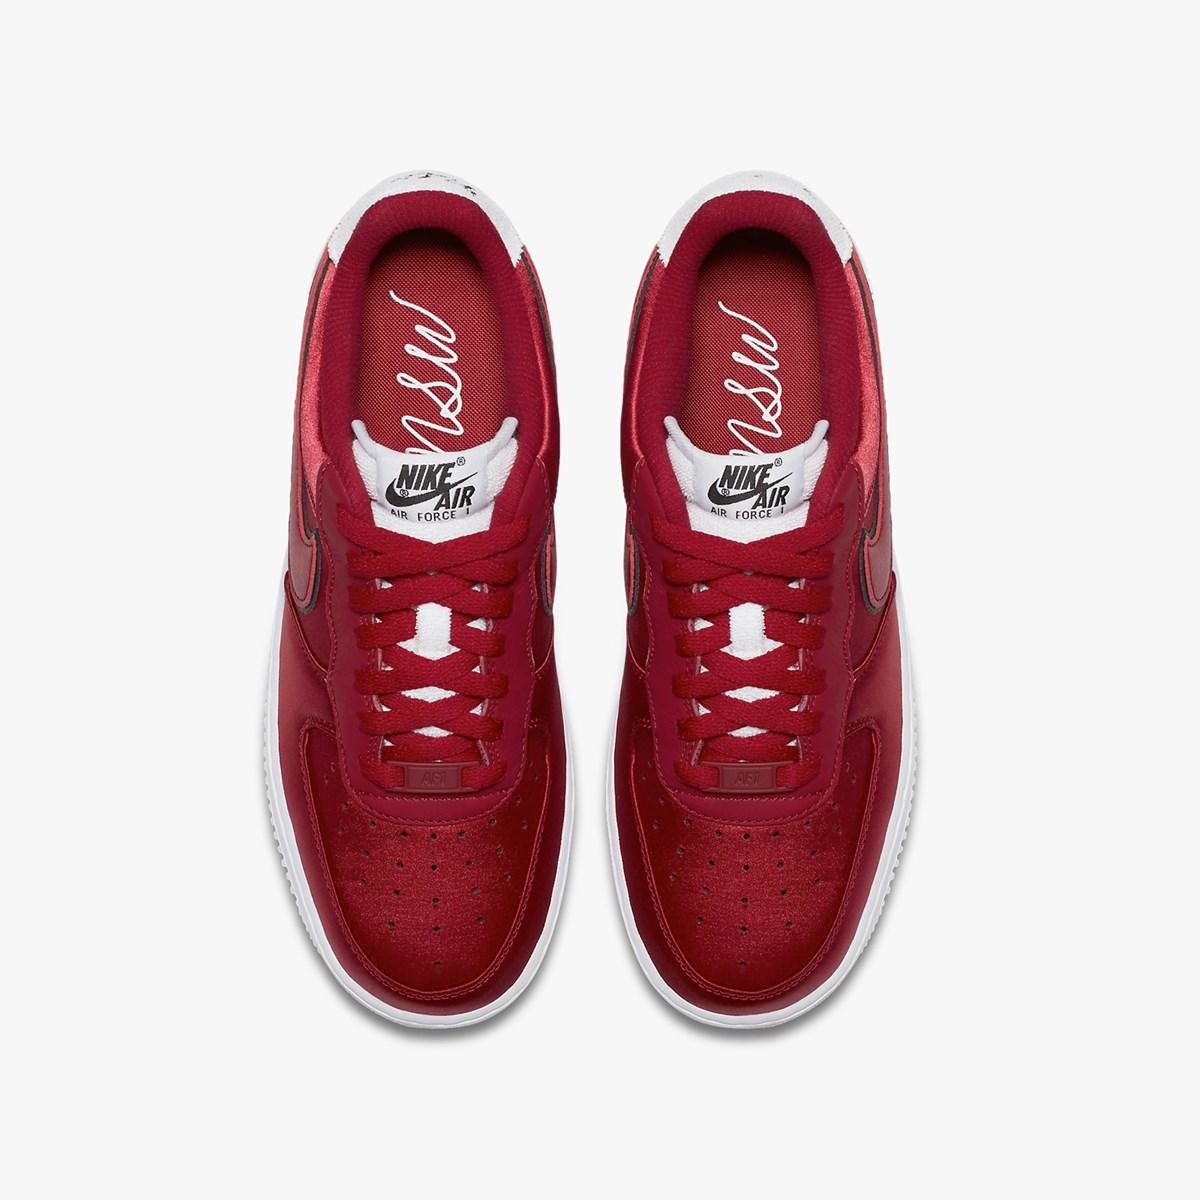 Nike Wmns Air Force 1 07 SE - Aa0287-602 - SNS   sneakers & streetwear en ligne depuis 1999